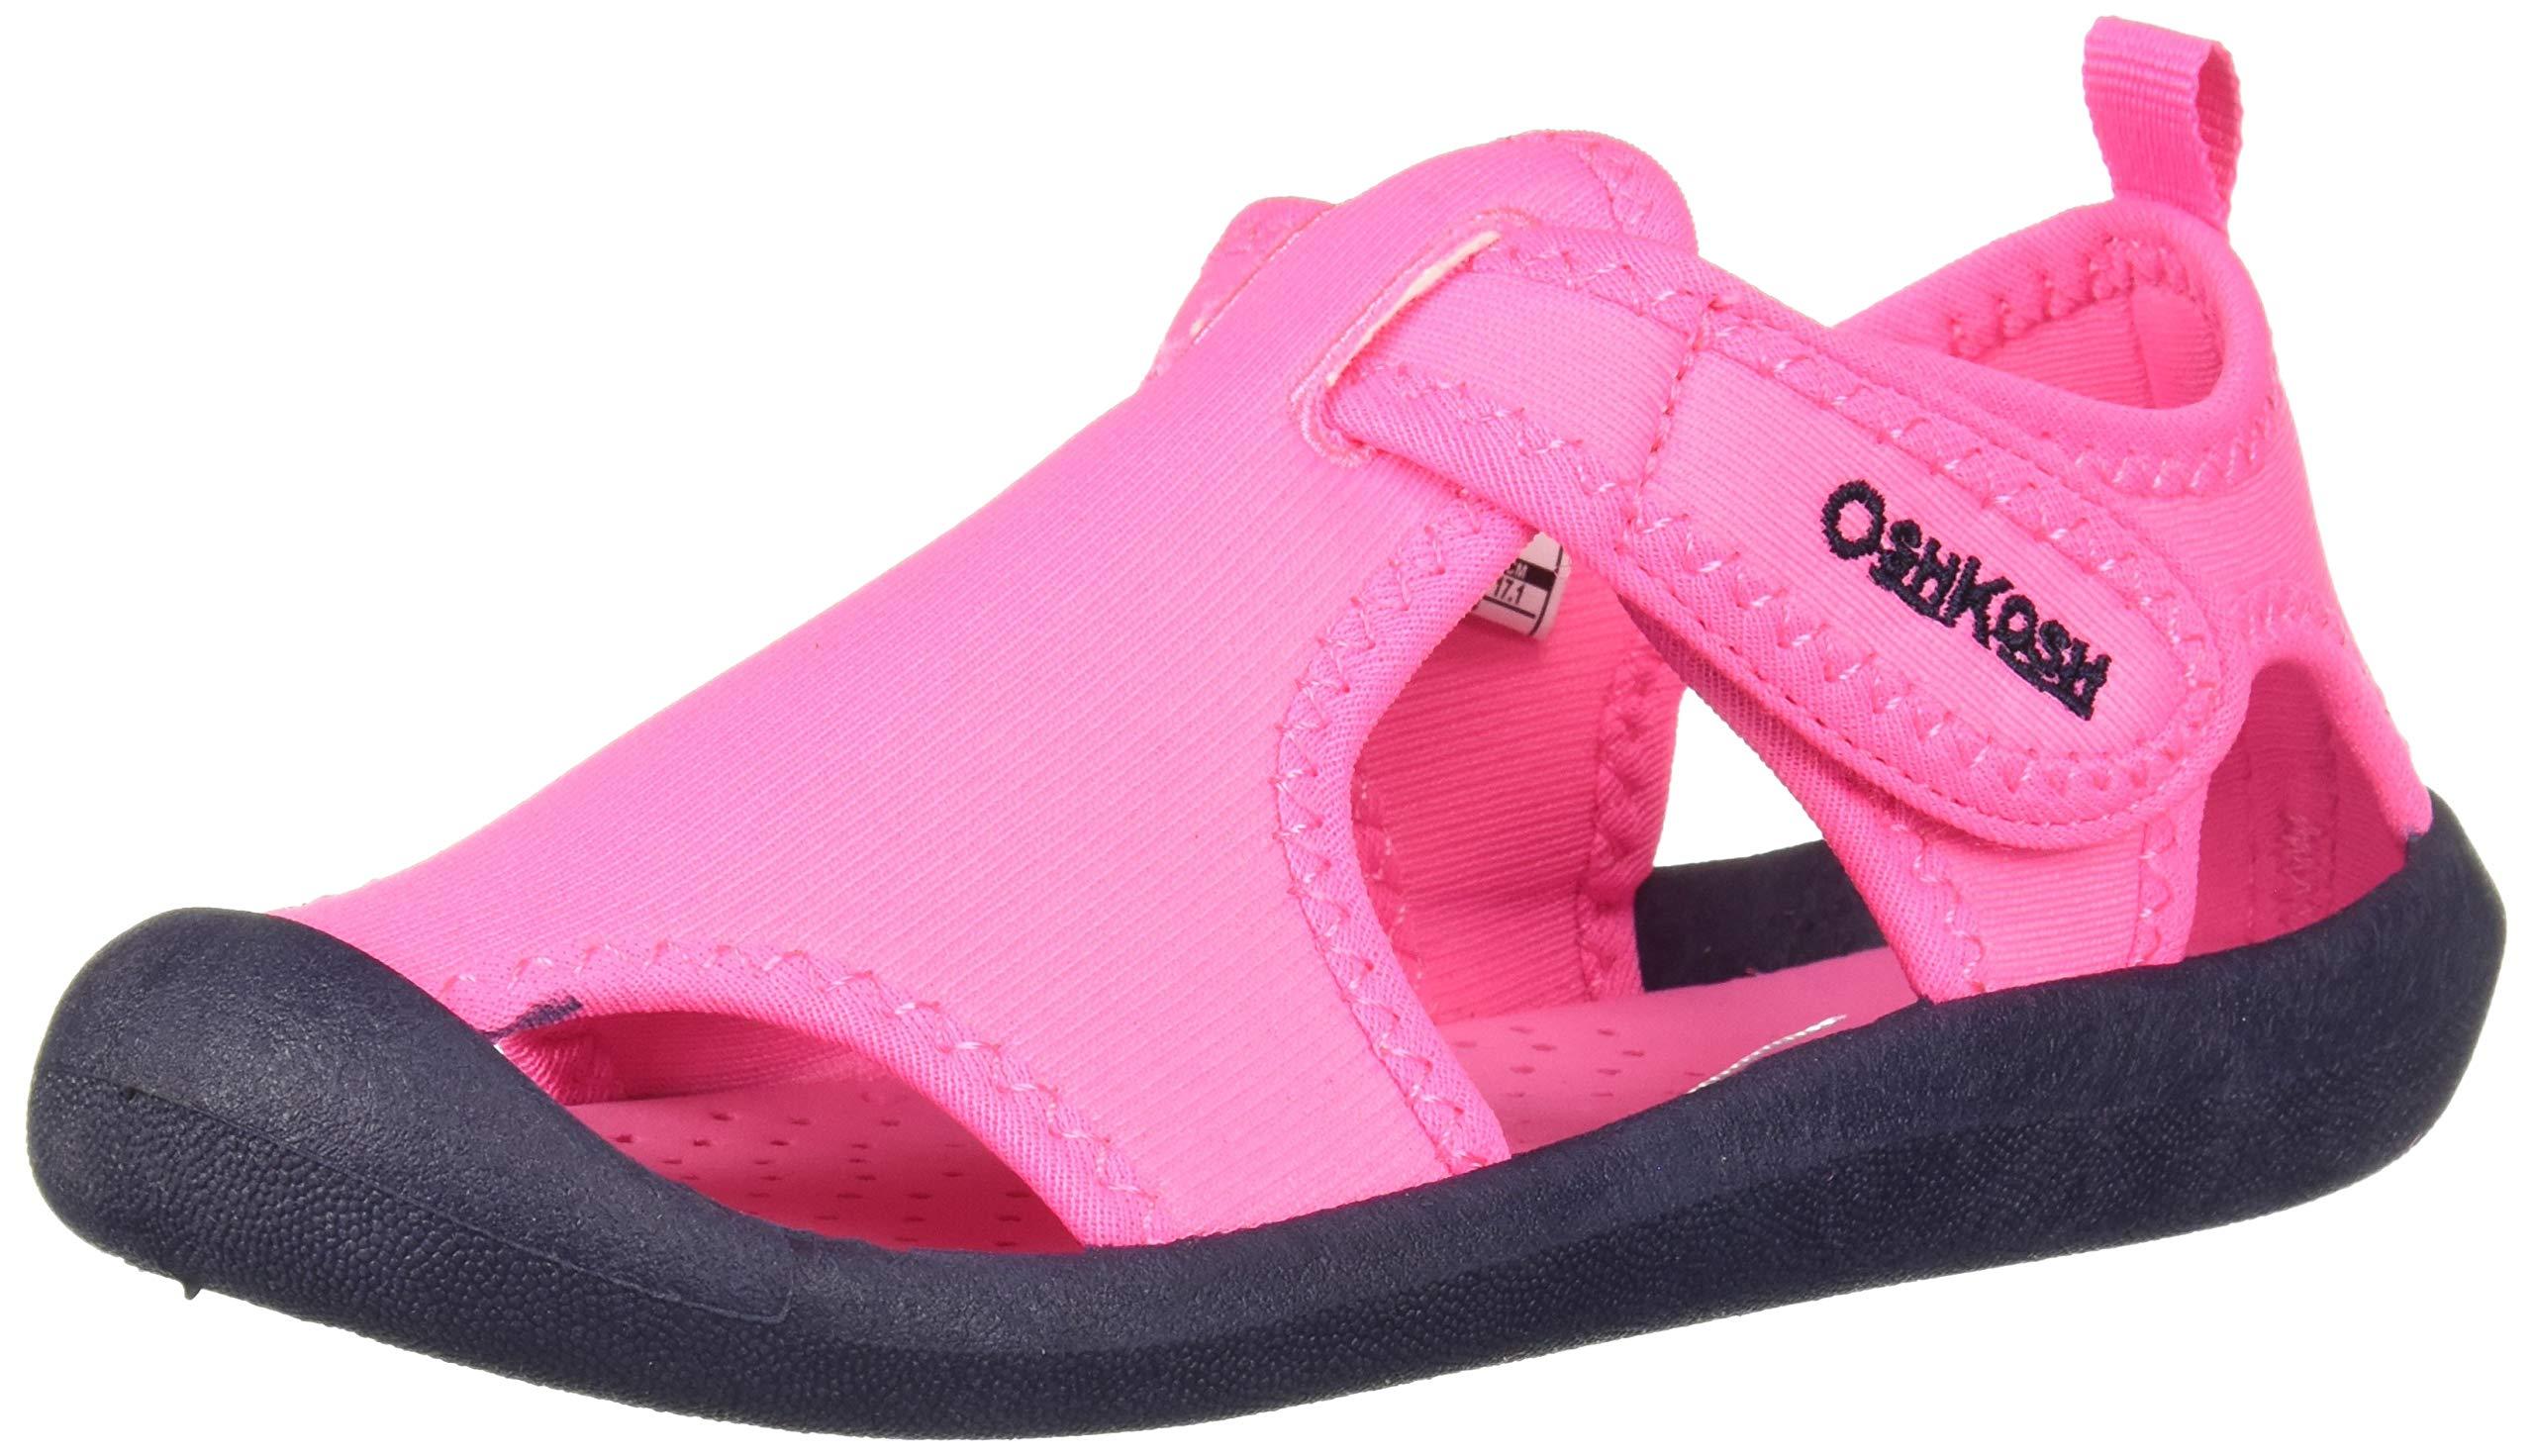 OshKosh B'Gosh Aquatic Girl's and Boy's Water Shoe, Fuchsia 10 M US Toddler